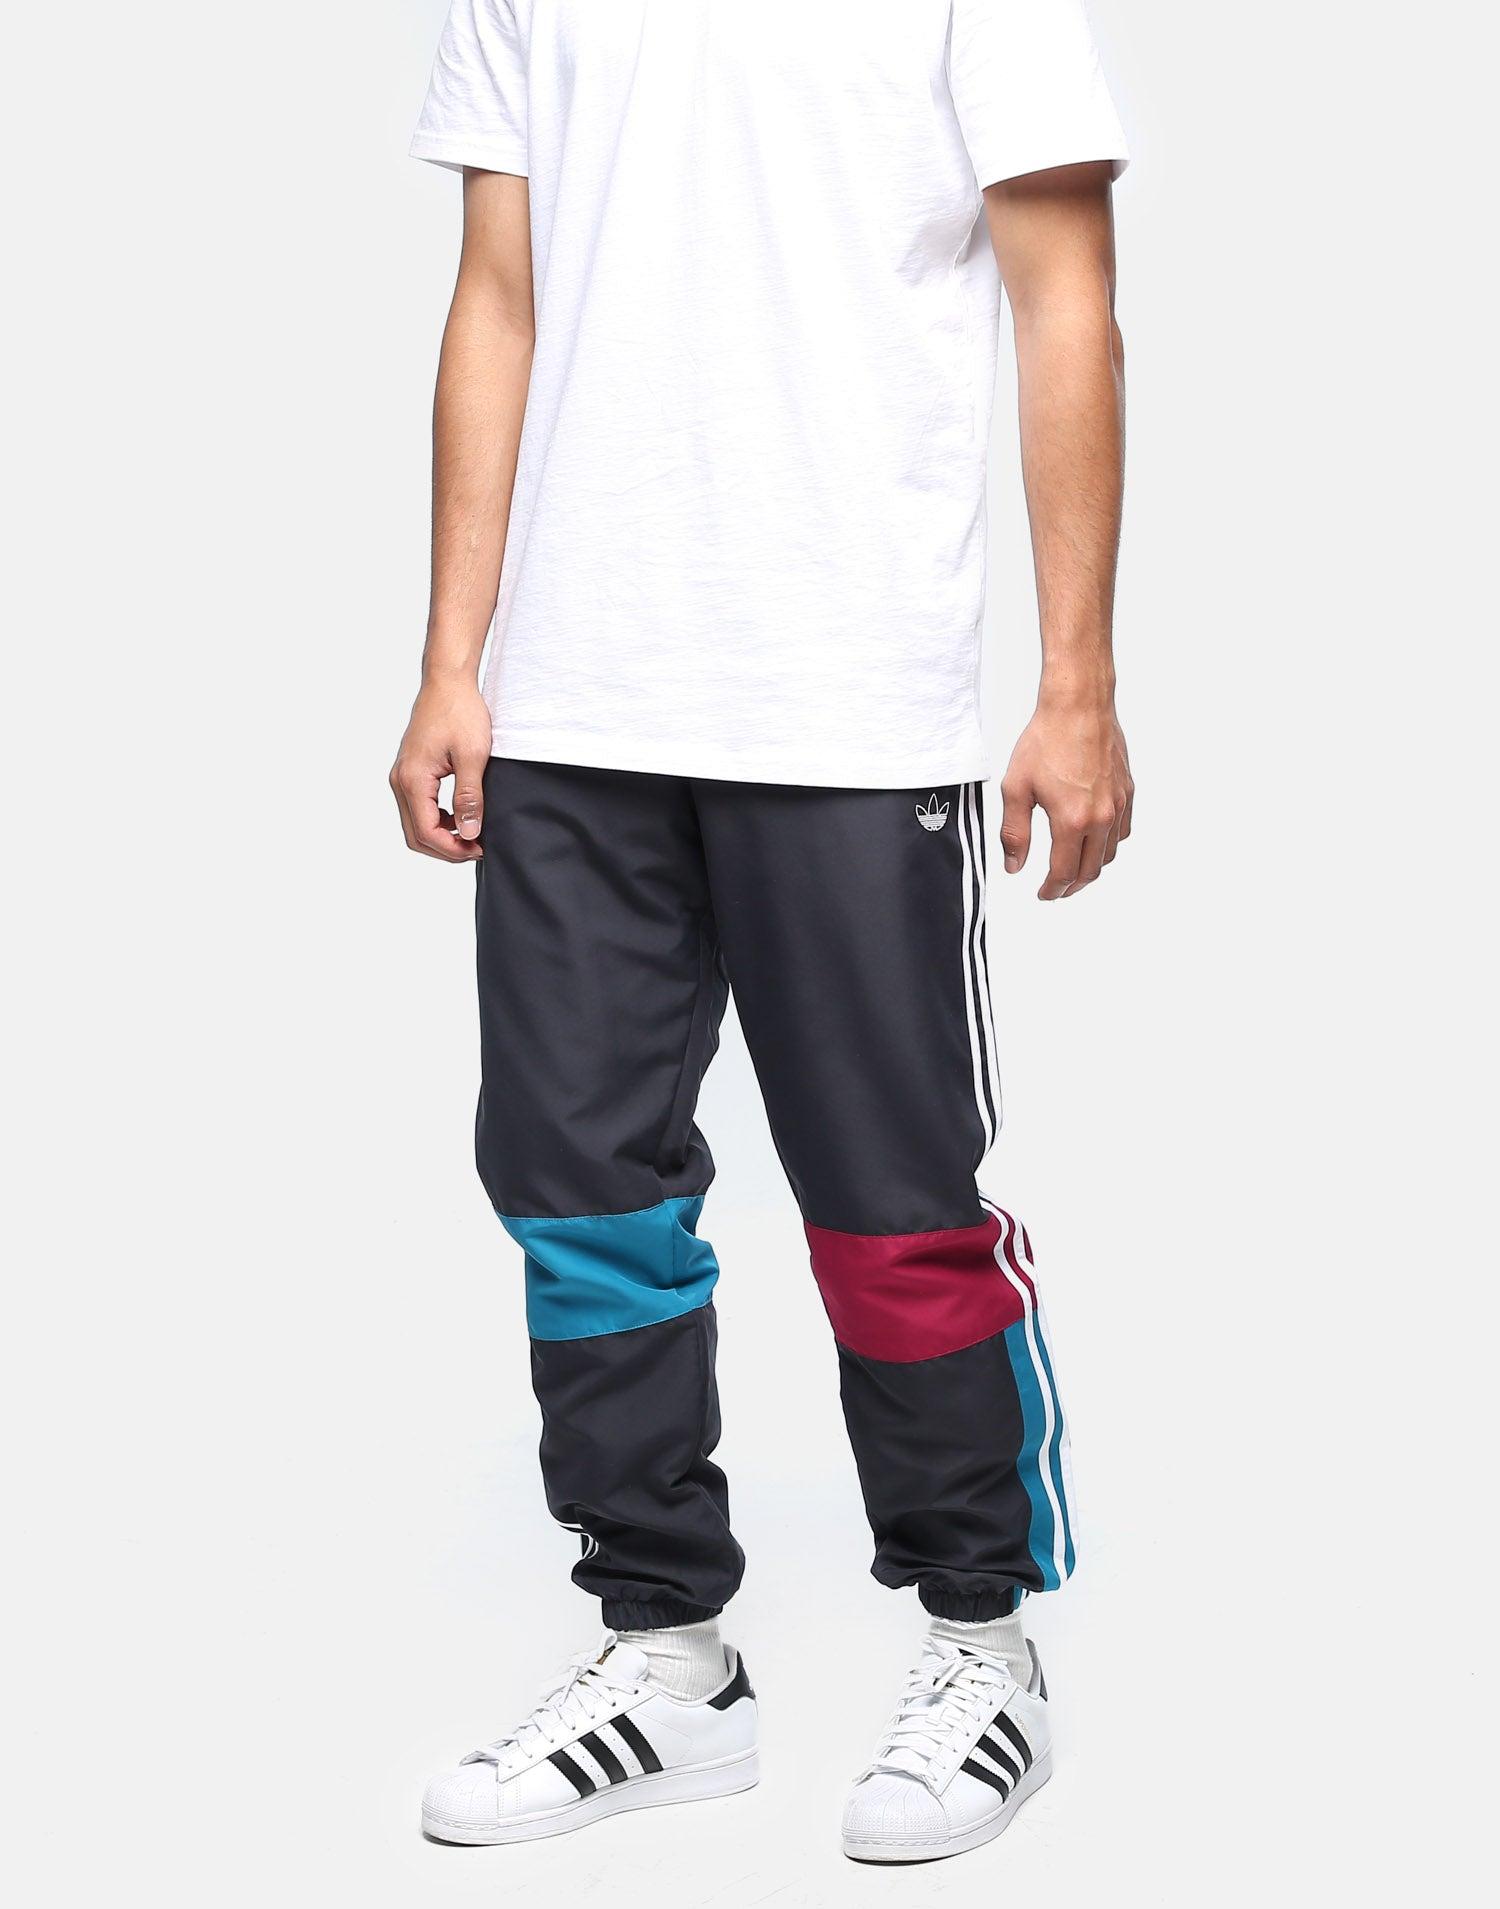 NBA Miami Heat New Era Core Fleece Pants Trousers Bottoms Mens